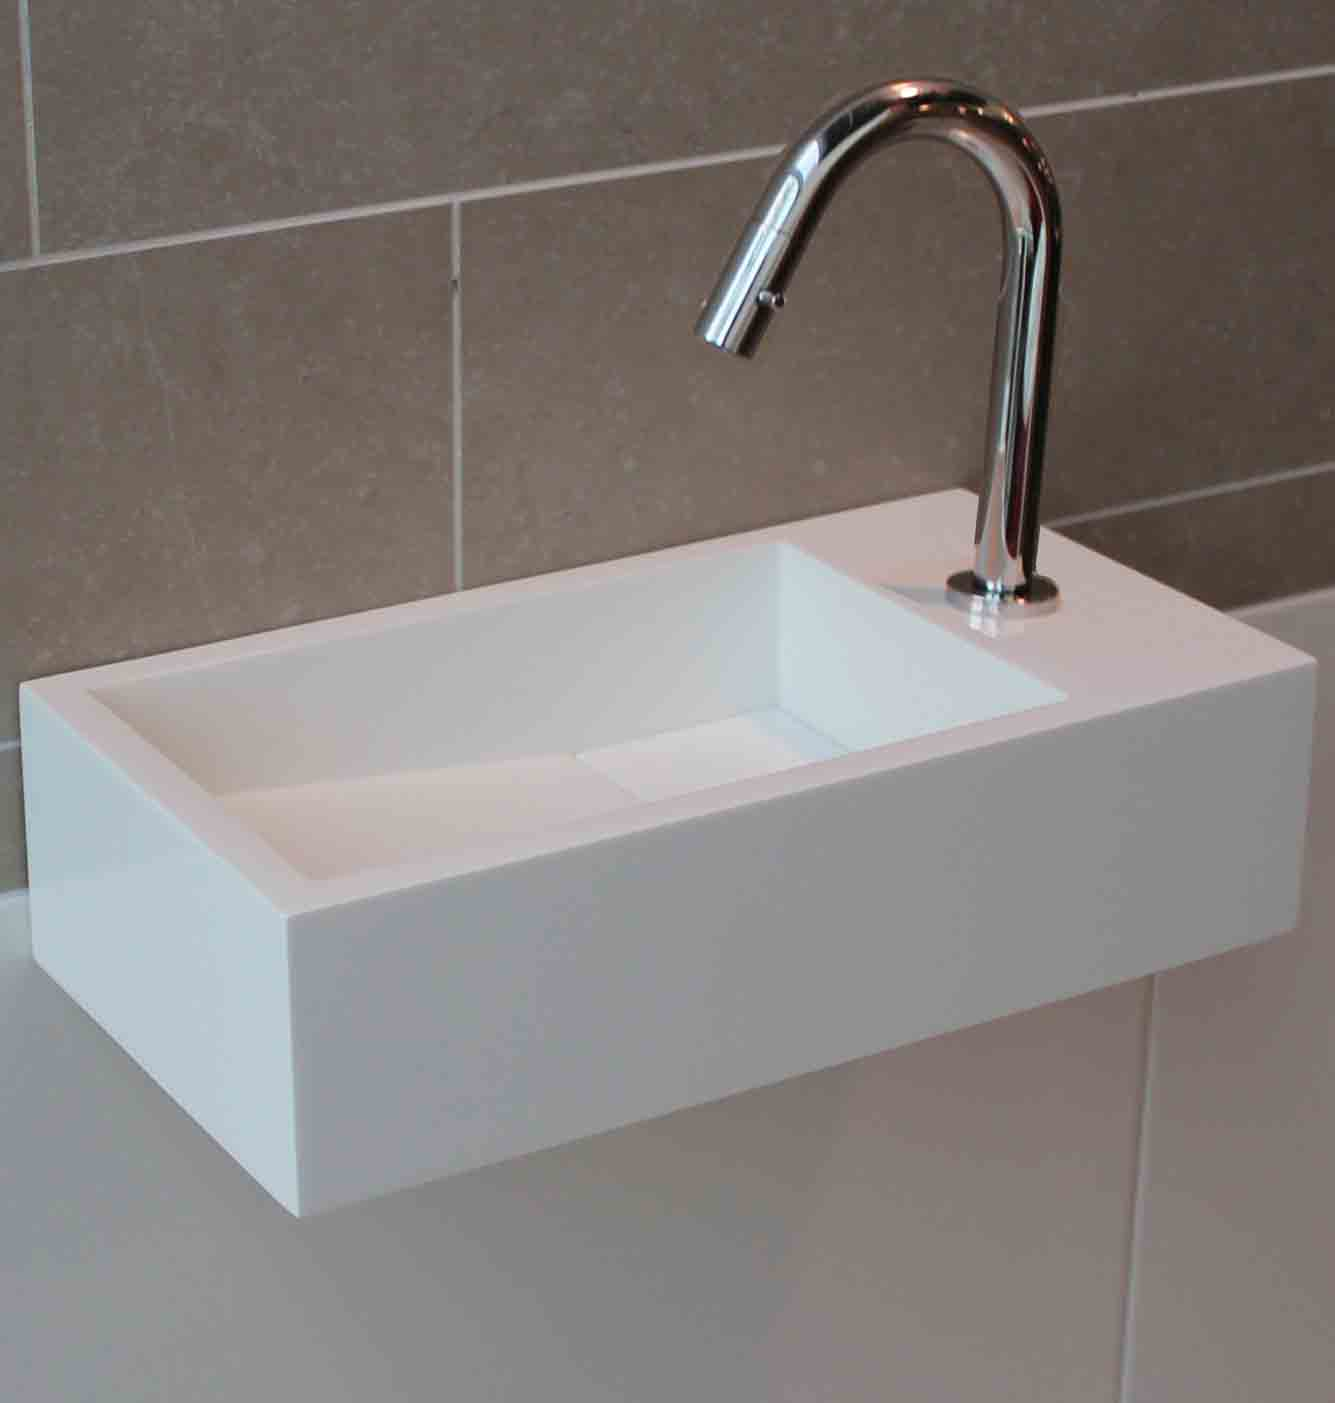 Fa gebr de boer fontein - Toilet wastafel ...